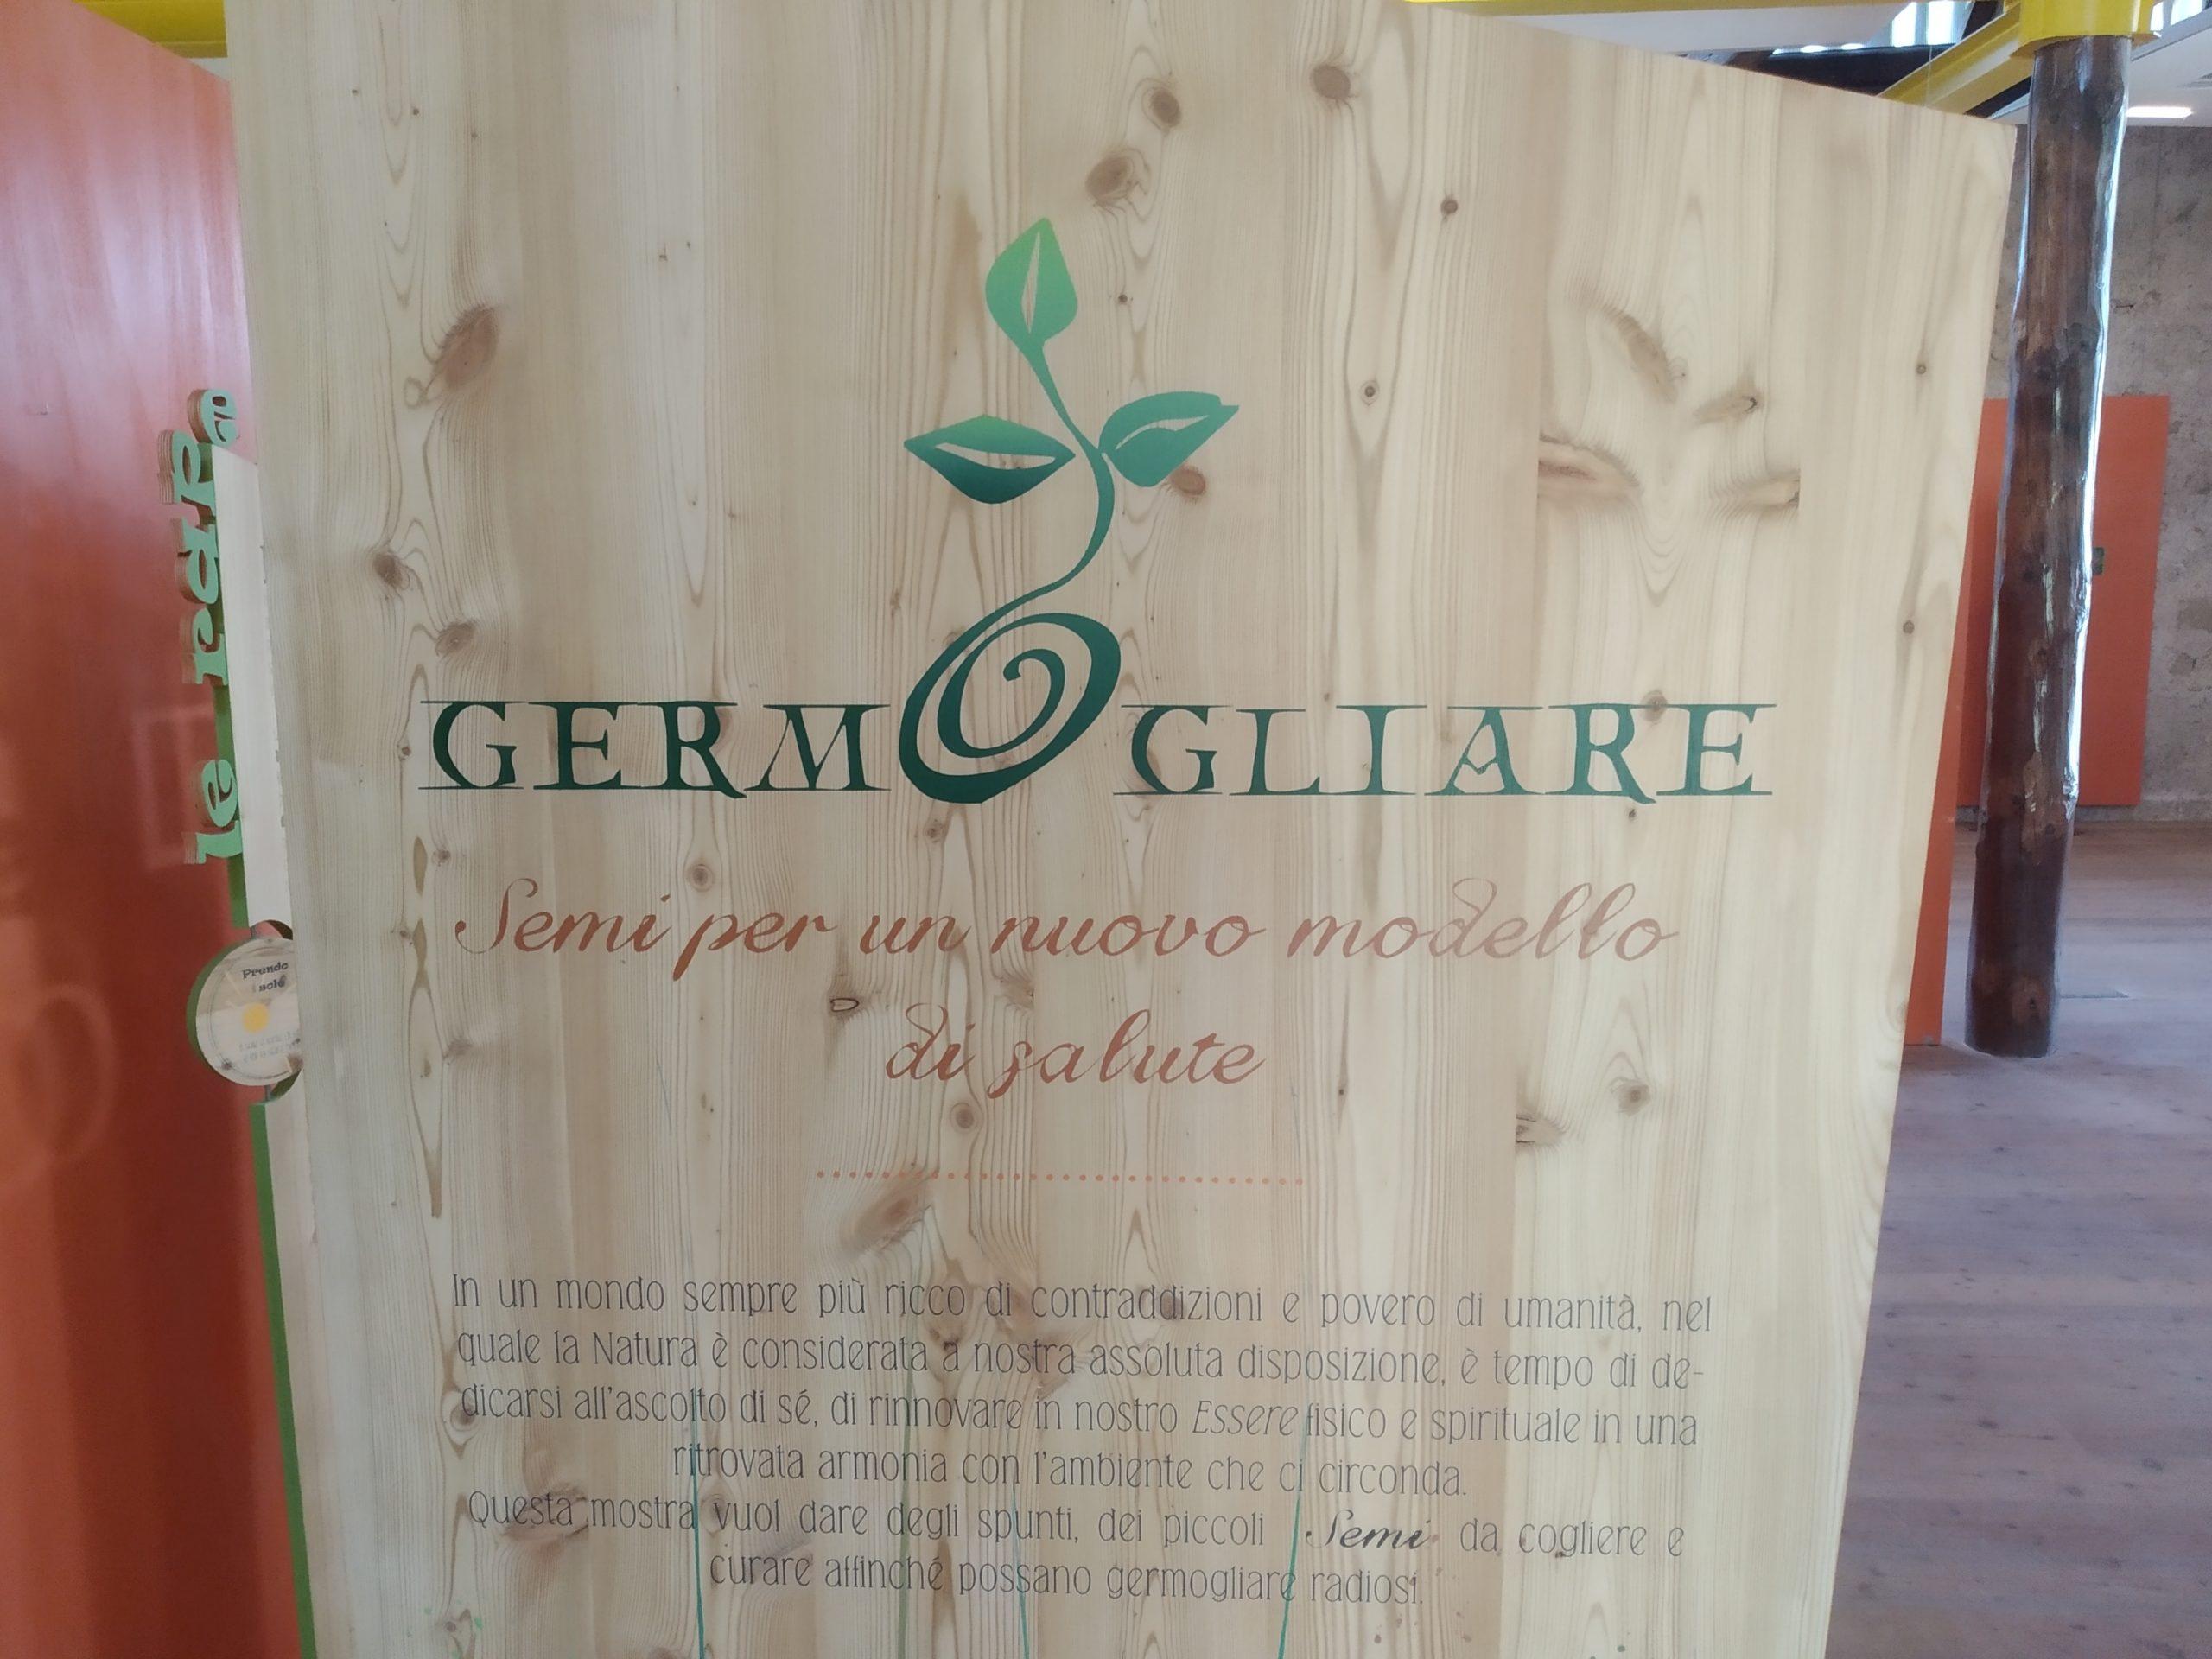 Germogliare-logo-scaled